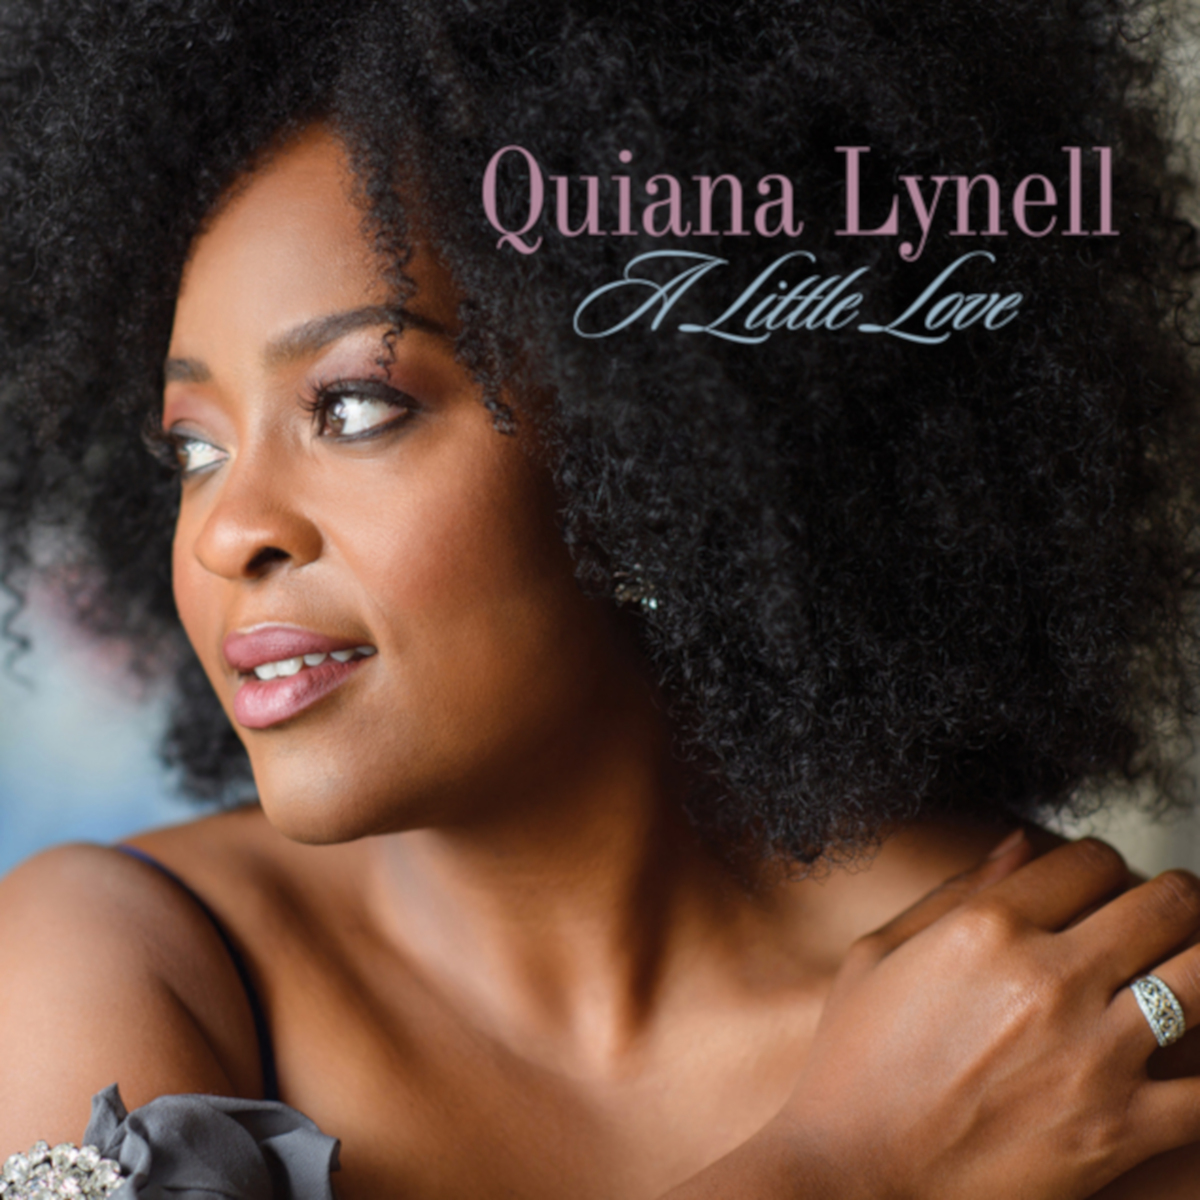 Quiana Lynell <br/>A Little Love <br/> Concorde, 2019